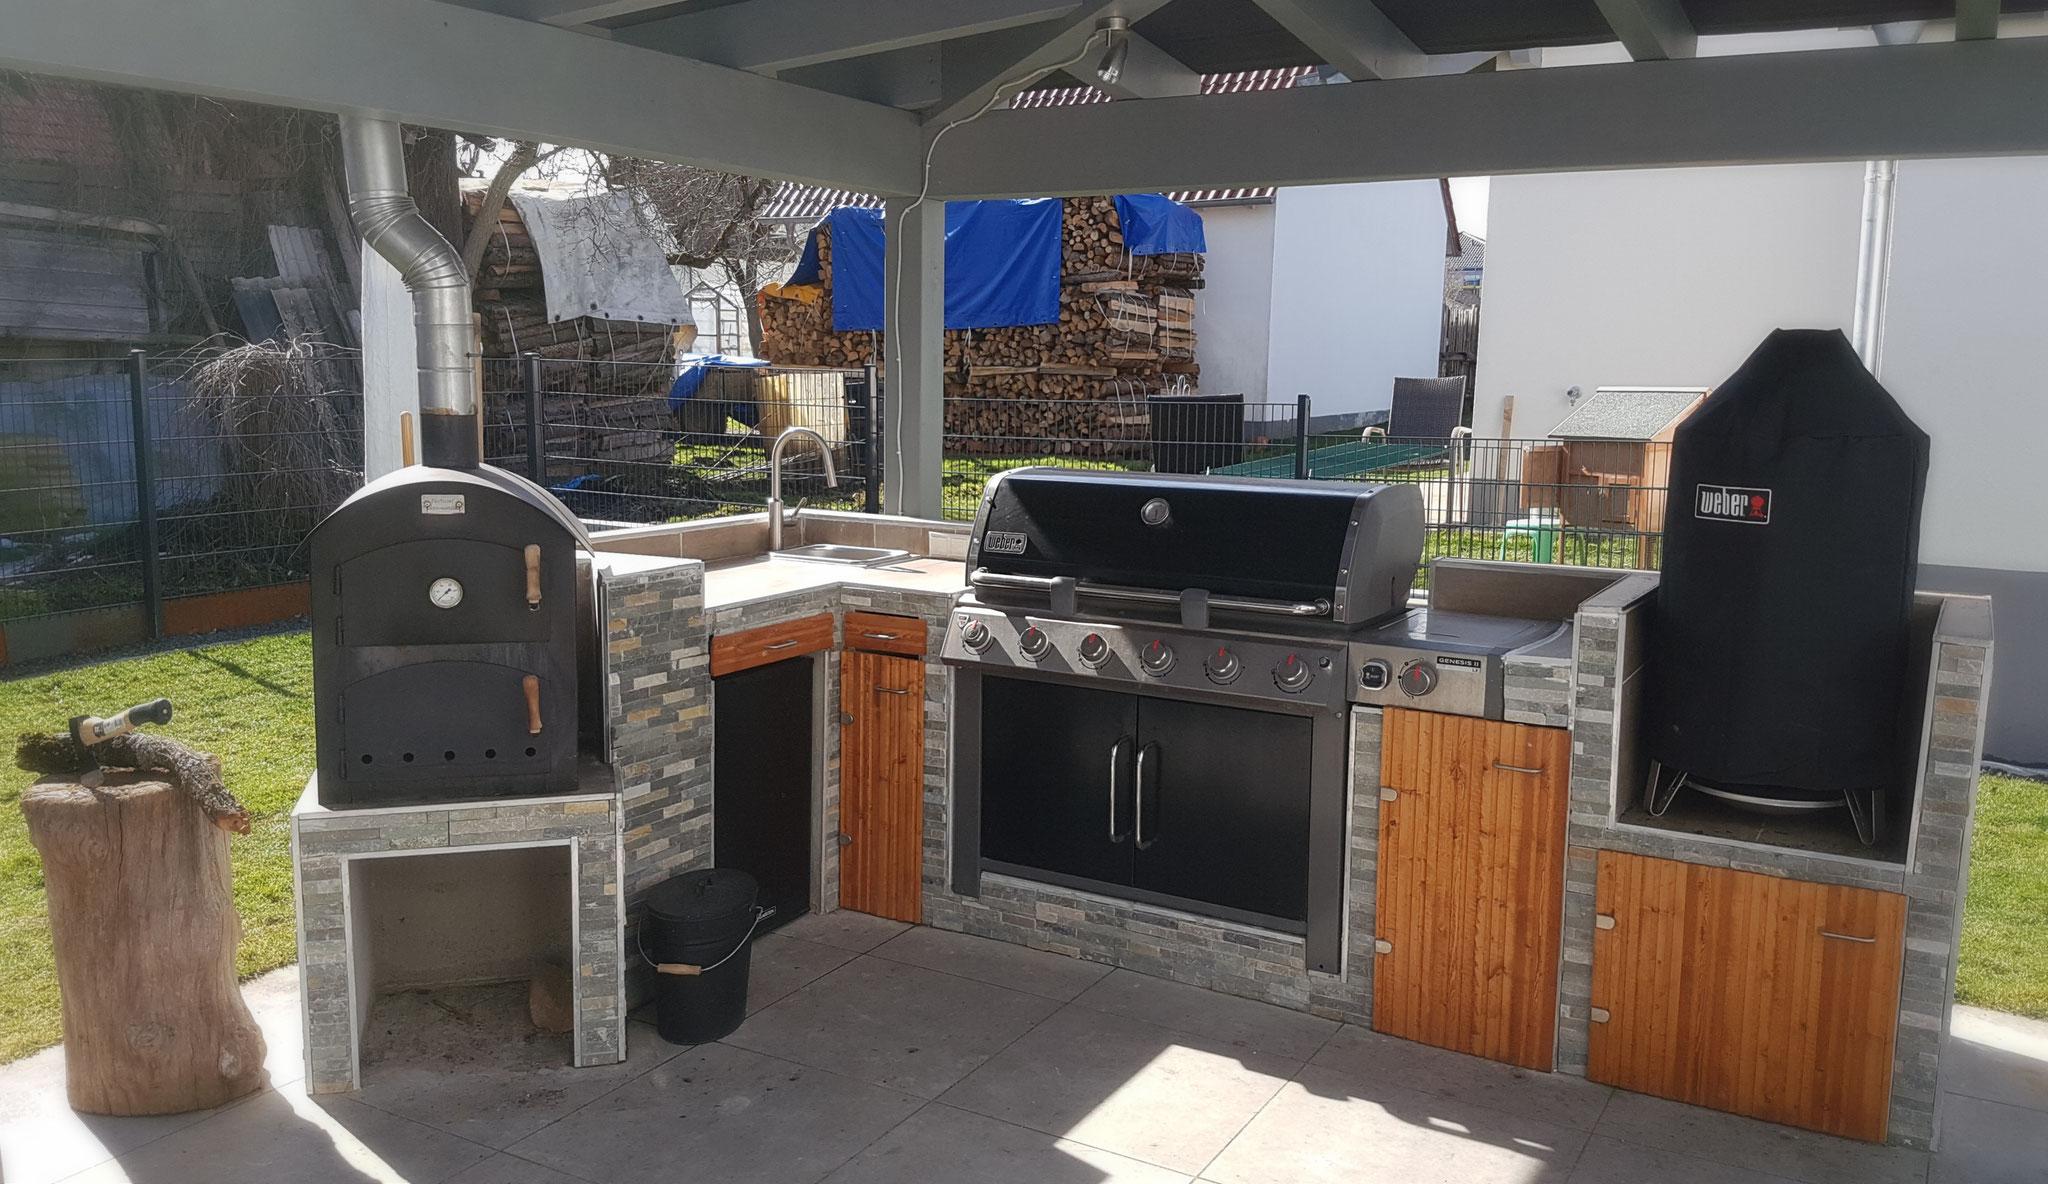 Outdoor Küche Rezepte : Koch überm feuer rezepte outdoorküche und kochutensilien